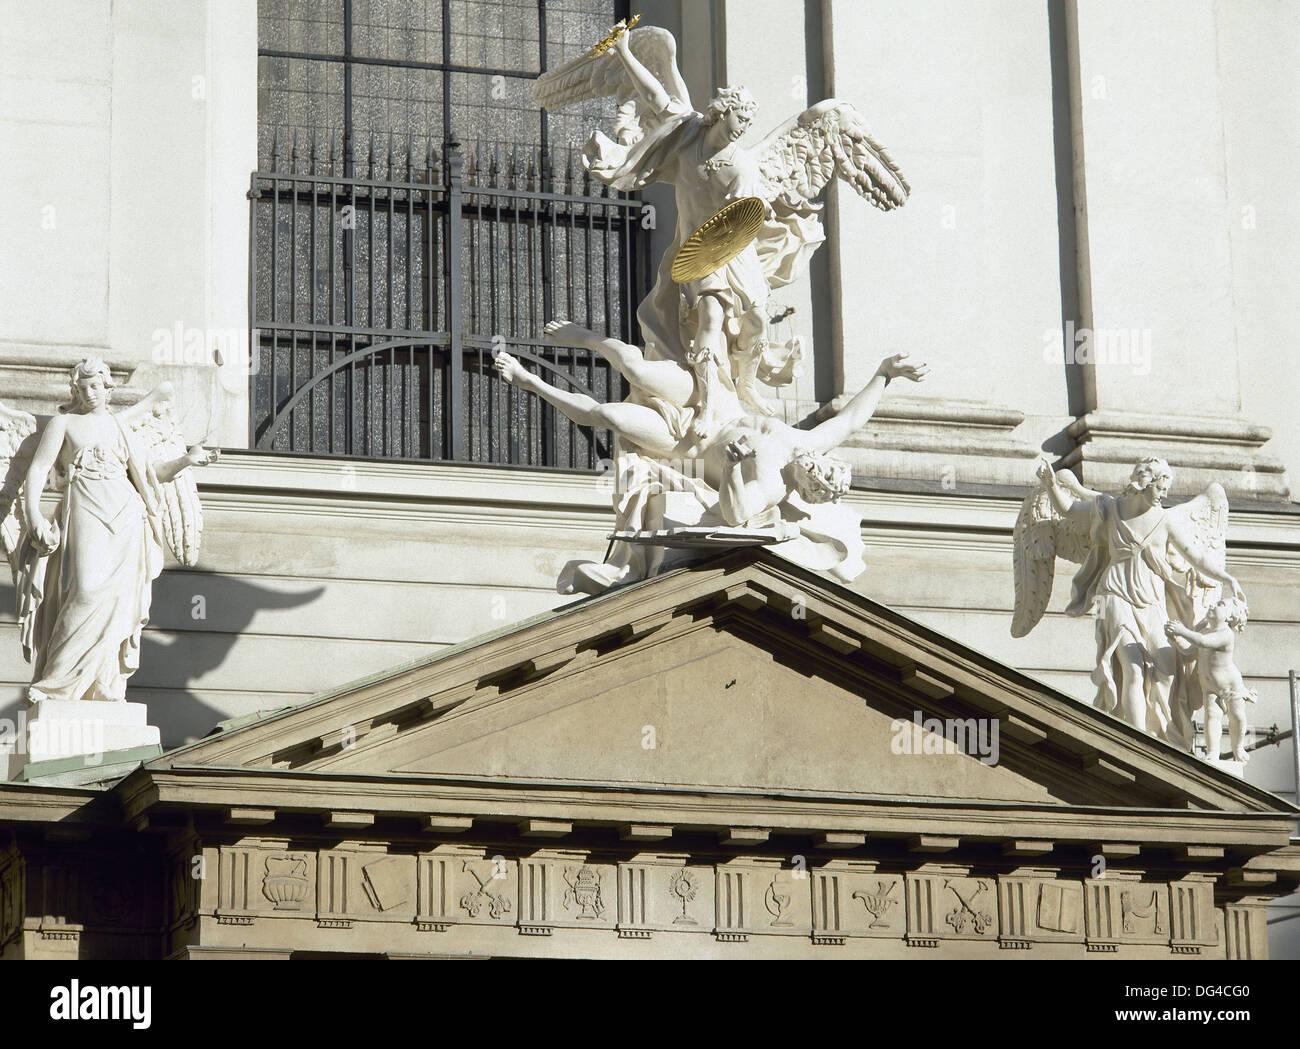 Austria. Vienna. Saint Michael's Church. Statue of Archangel Michael, 1725, by Lorenzo Mattielli (1678/88-1748). - Stock Image